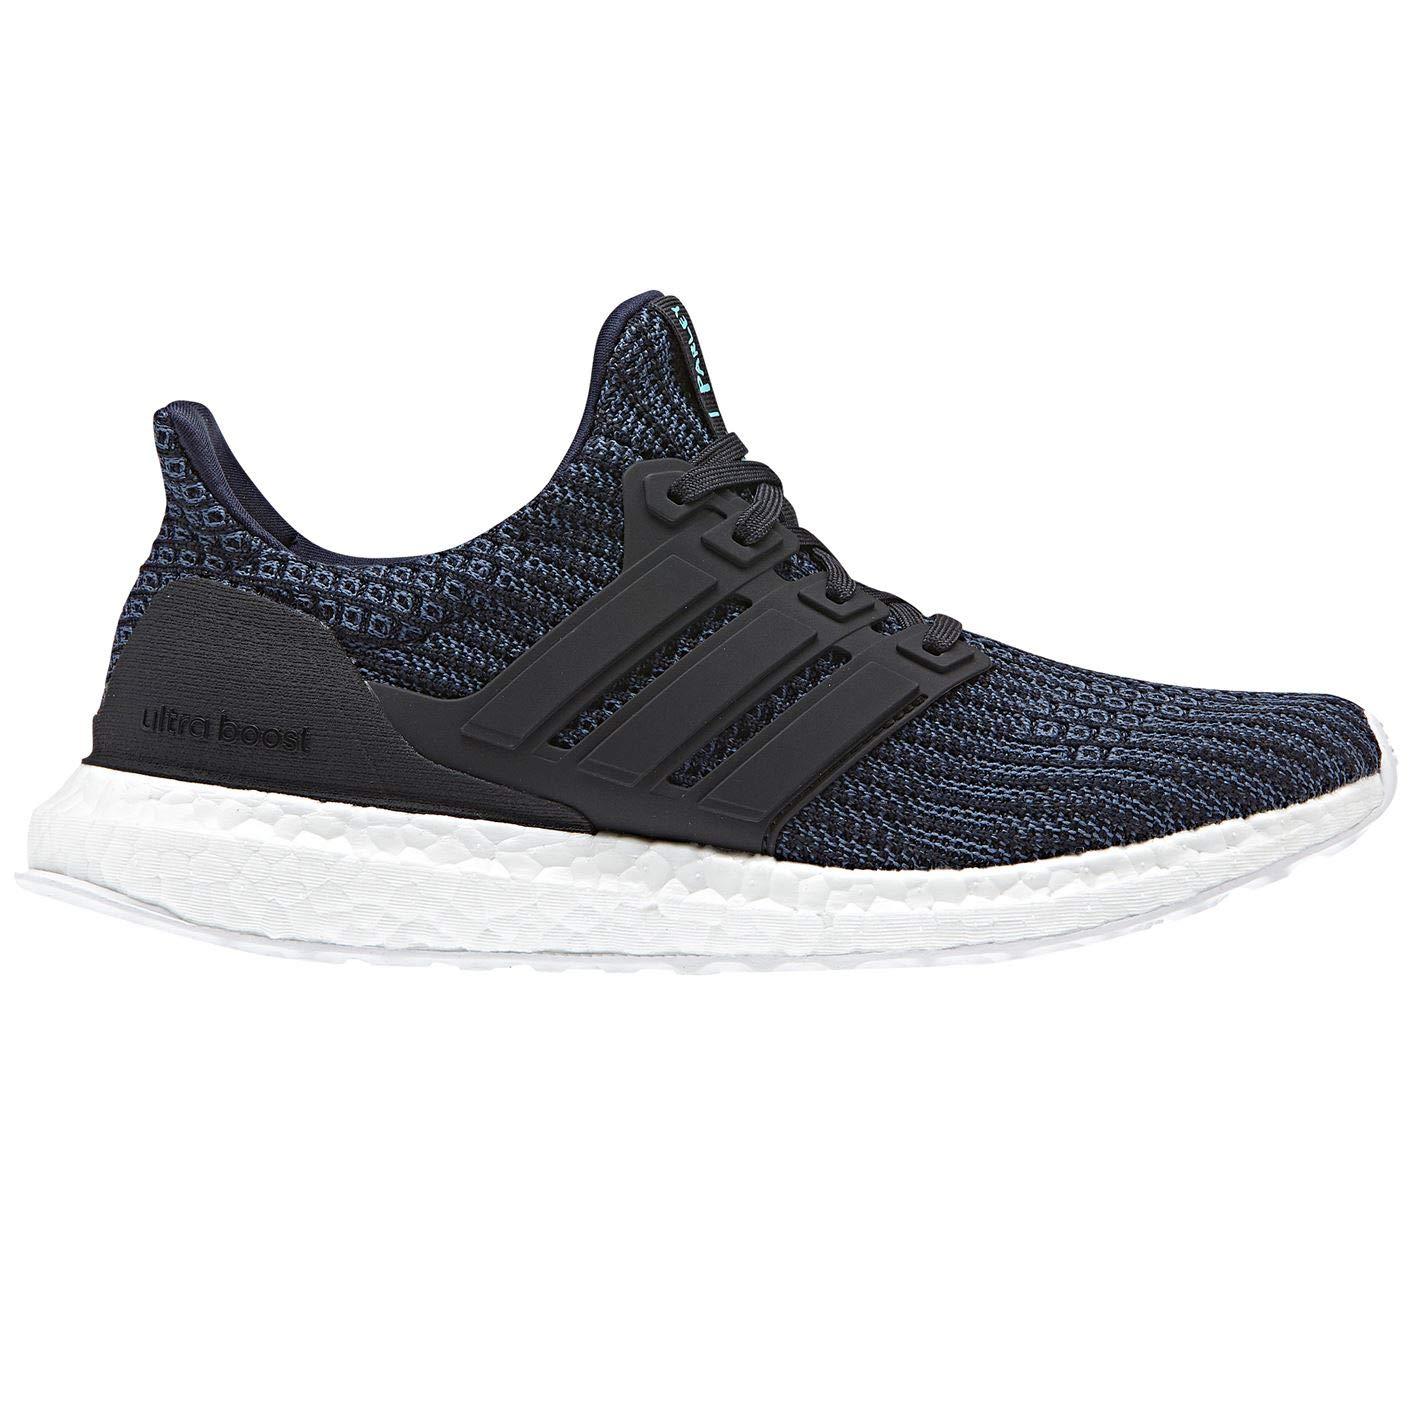 Adidas Ultraboost w Schuhgröße UK UK UK 8 UK 1f6826